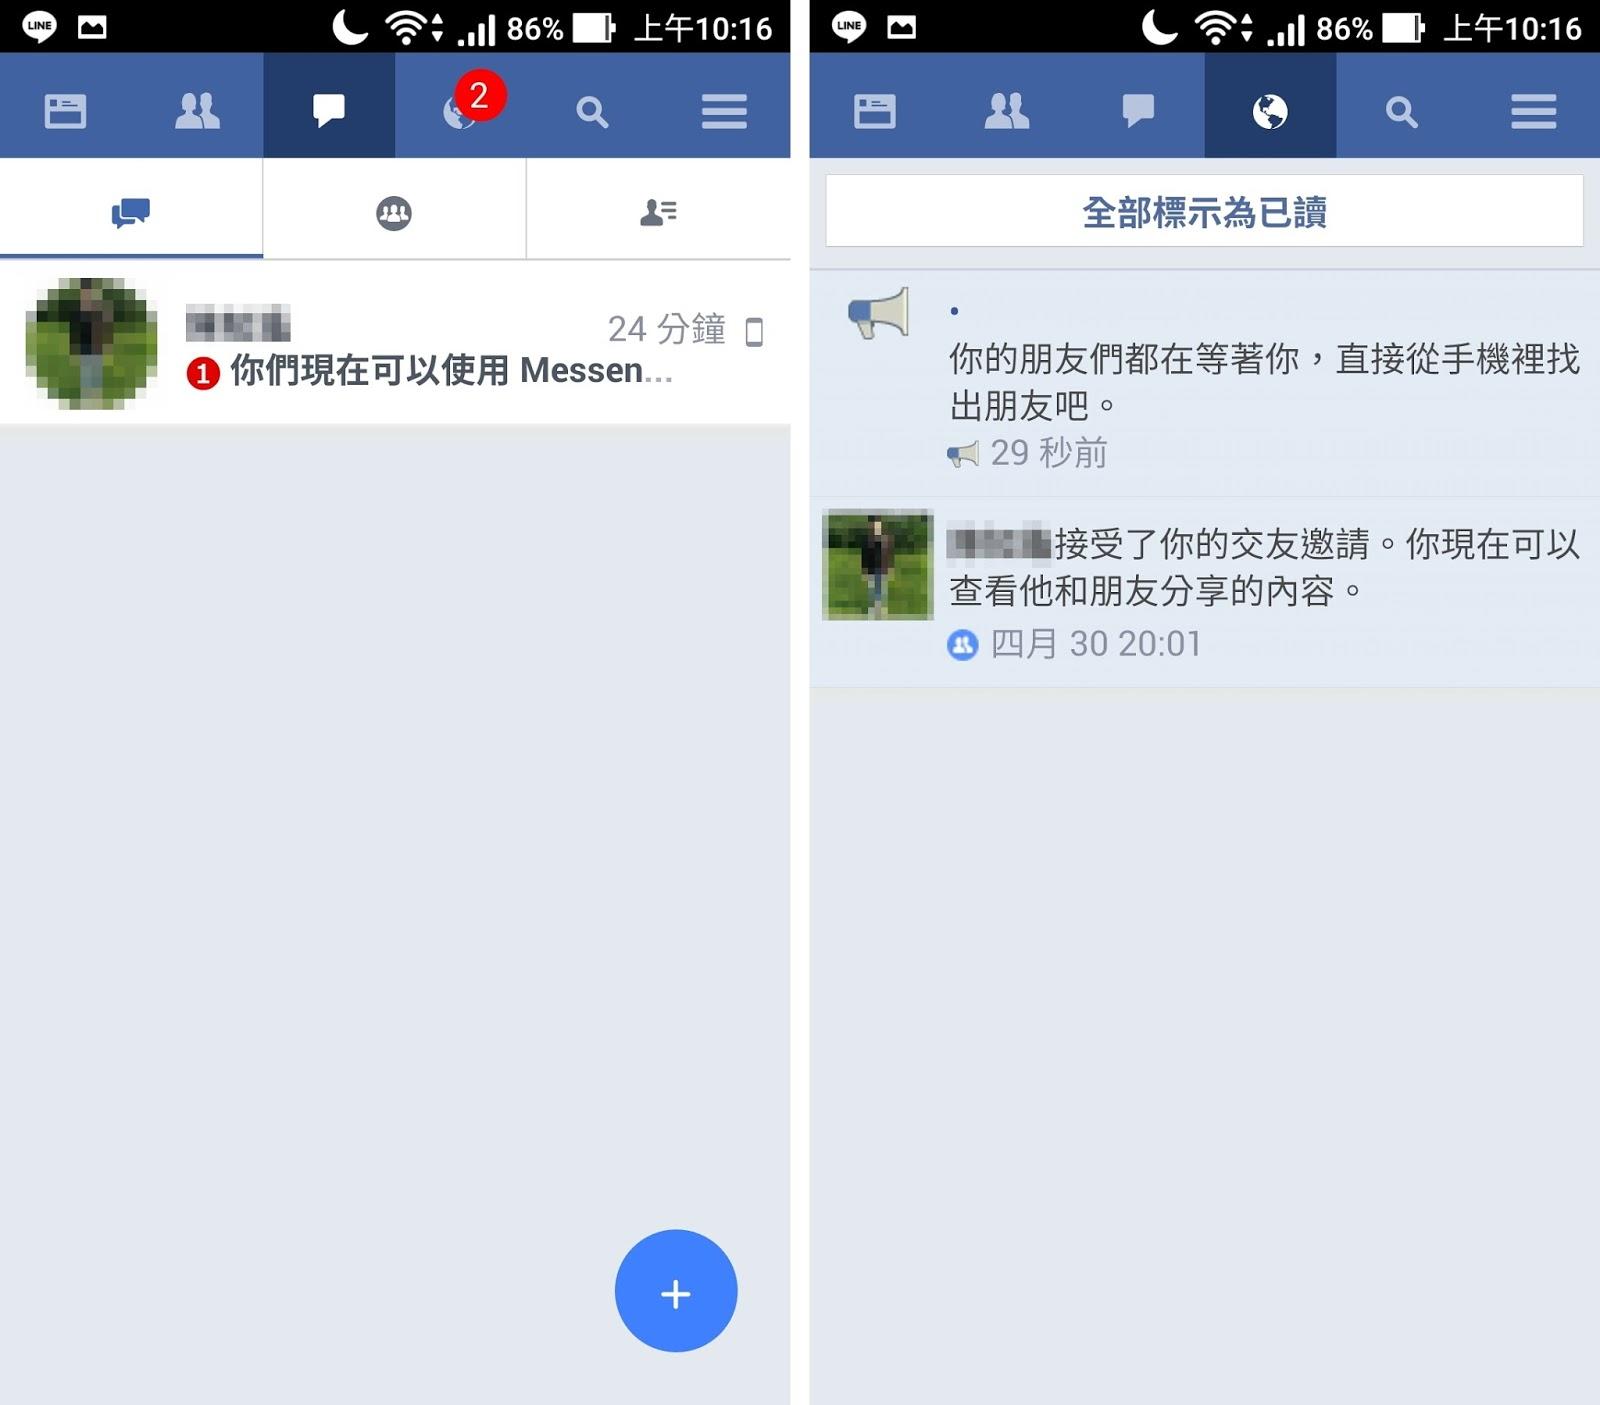 Screenshot 20170603 101610 - Facebook Lite - 官方推出的輕量版臉書App,超省流量及系統資源、把你用不到的功能給去掉!